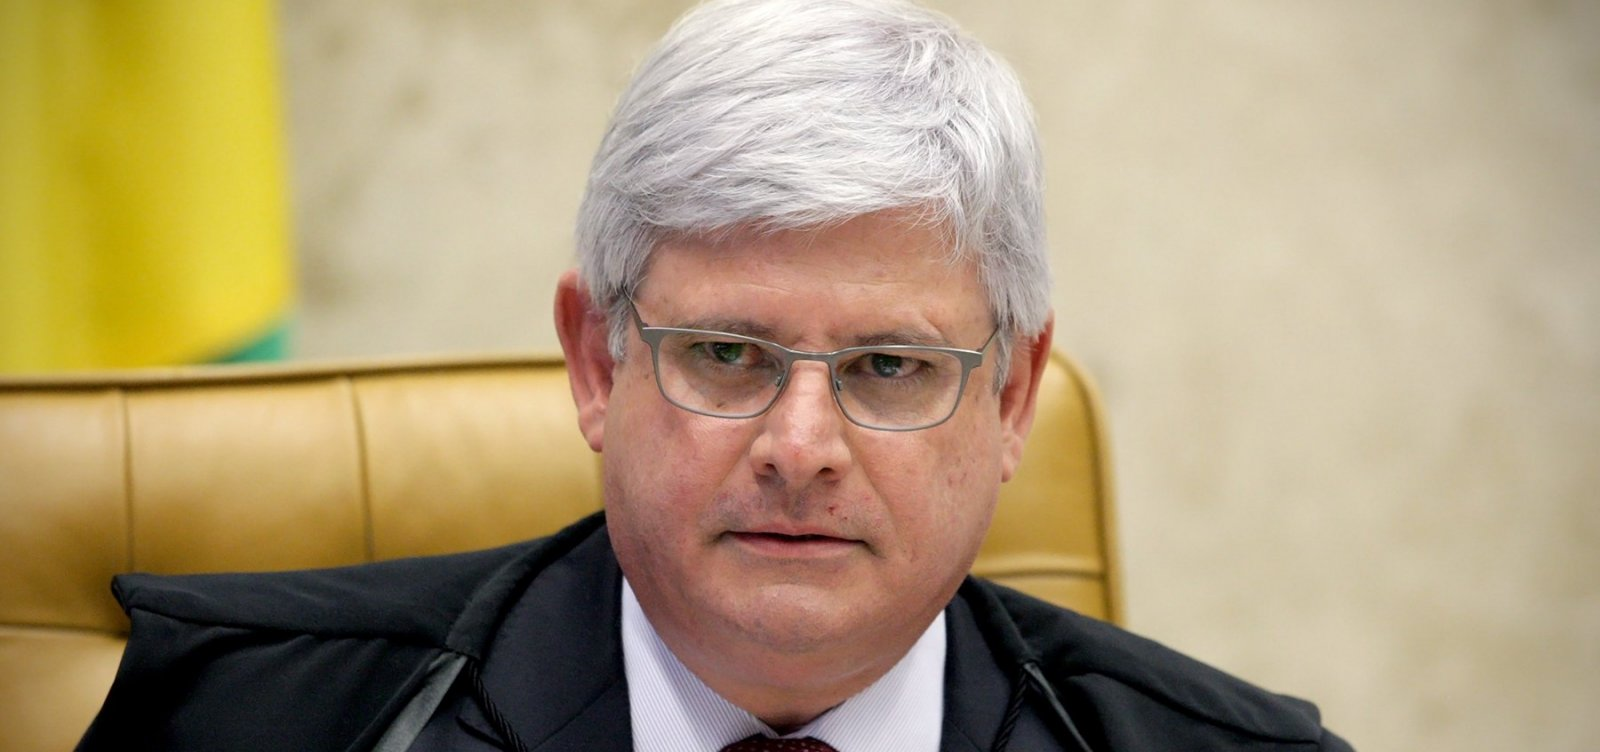 Janot critica 'intolerância' e declara voto em Haddad